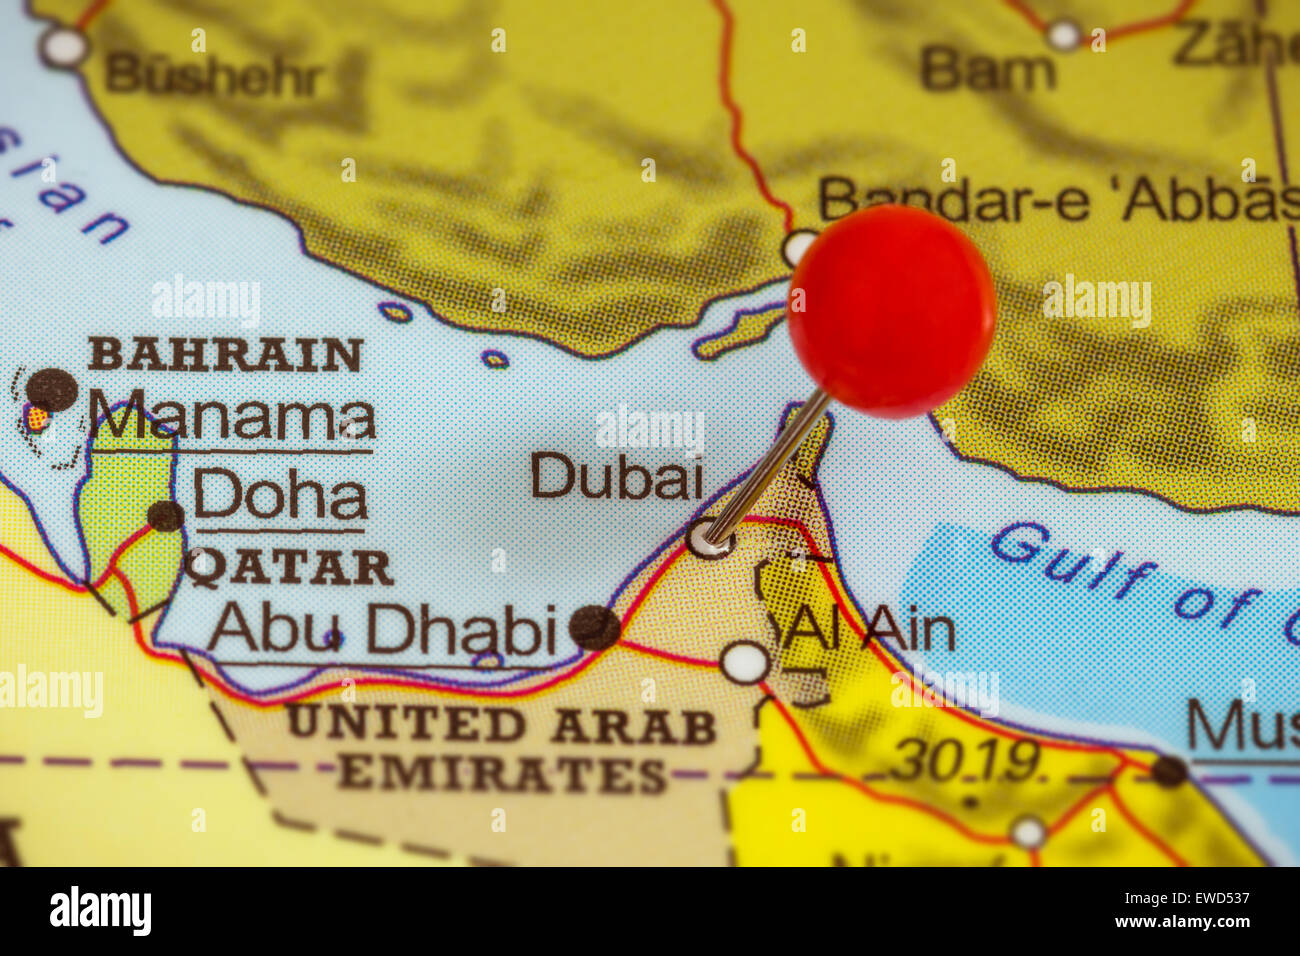 Dubai Sulla Cartina Geografica.Close Up Di Una Puntina Rossa Su Una Mappa Di Dubai Emirati Arabi Uniti Foto Stock Alamy